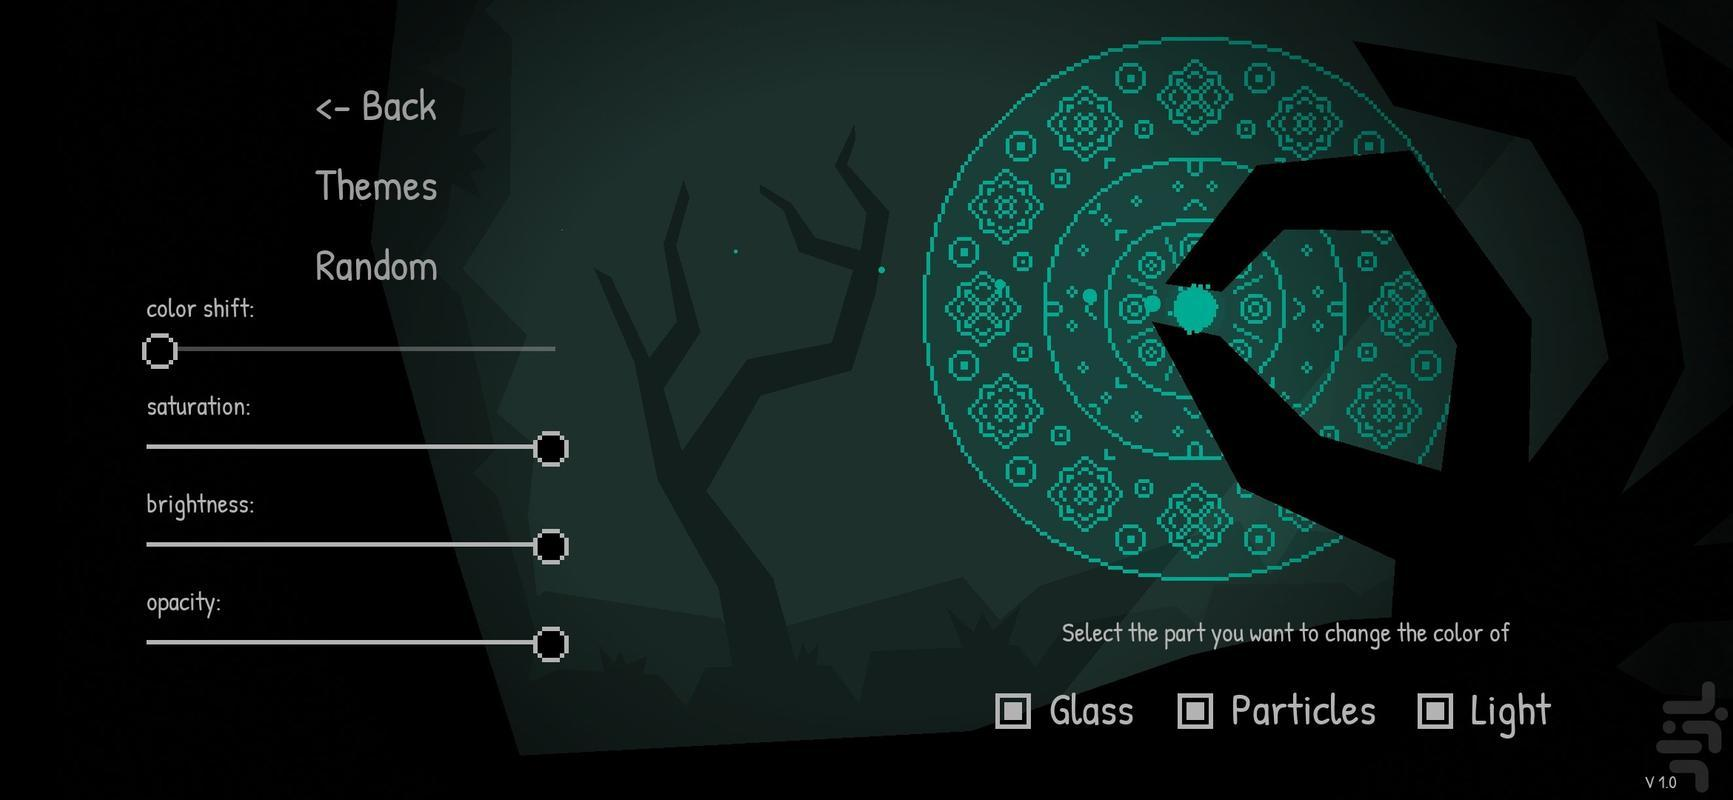 نورک (نور کوچولو) - عکس بازی موبایلی اندروید